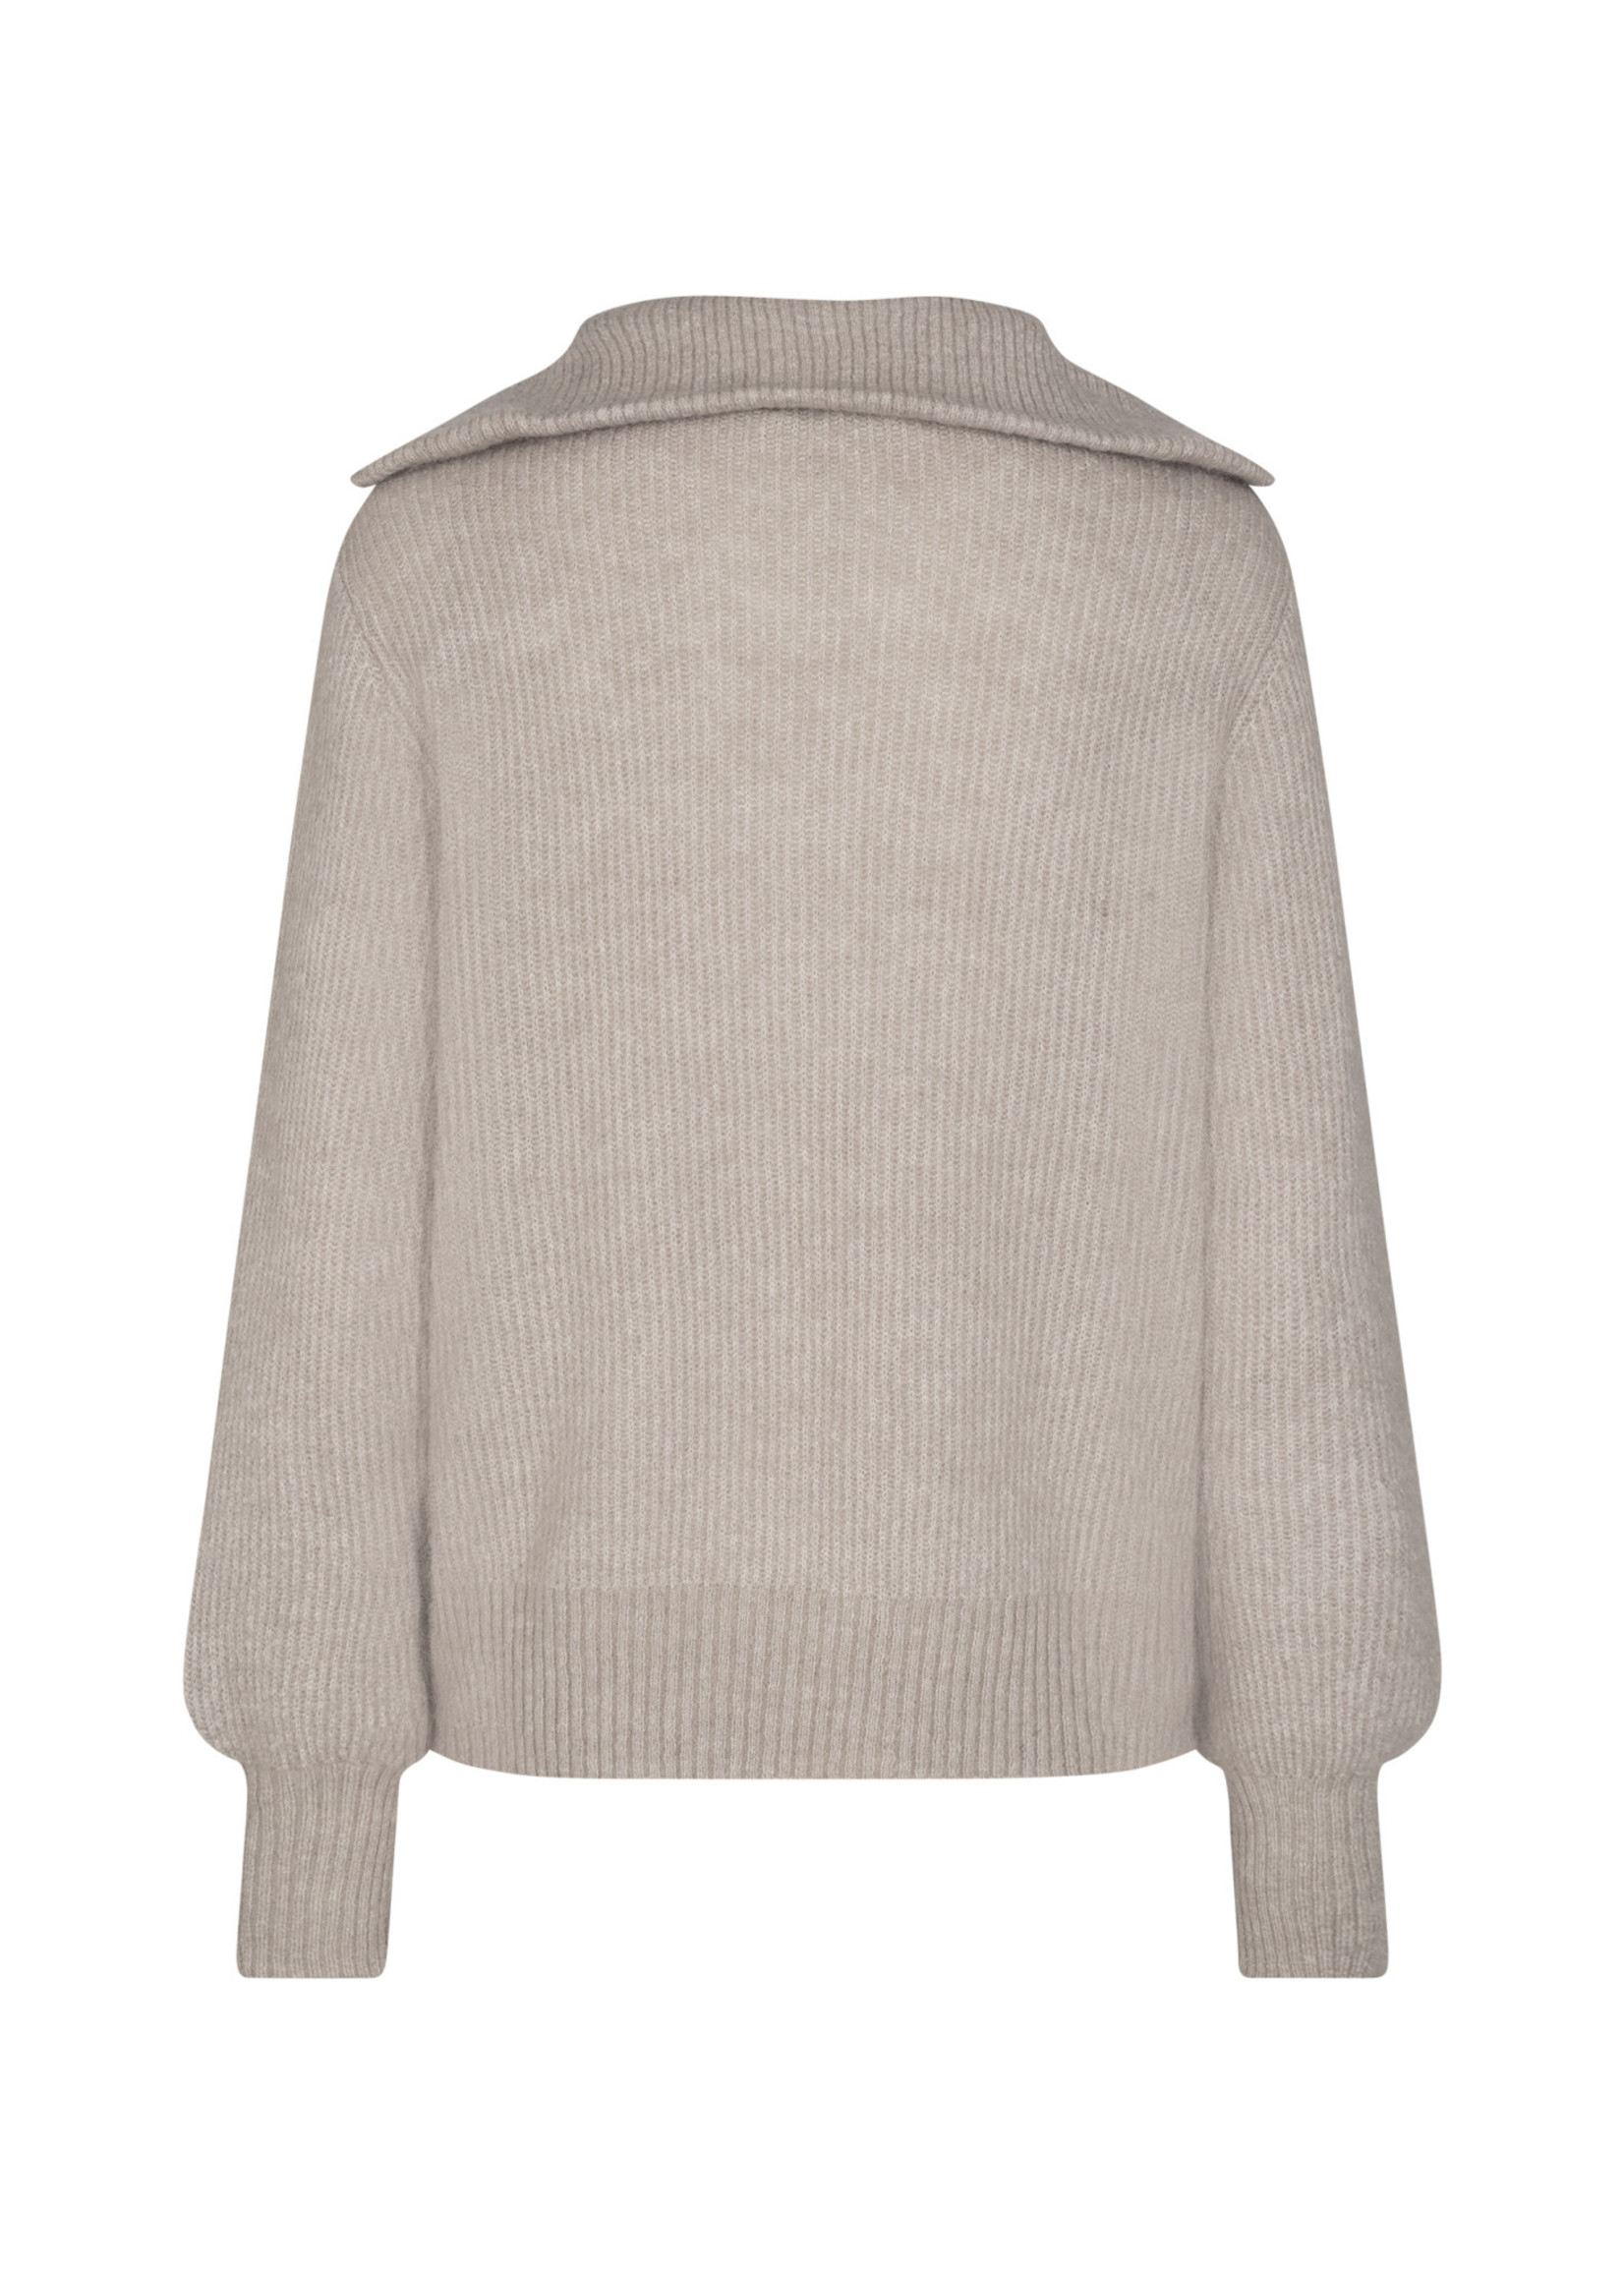 LeveteRoom Cille pullover